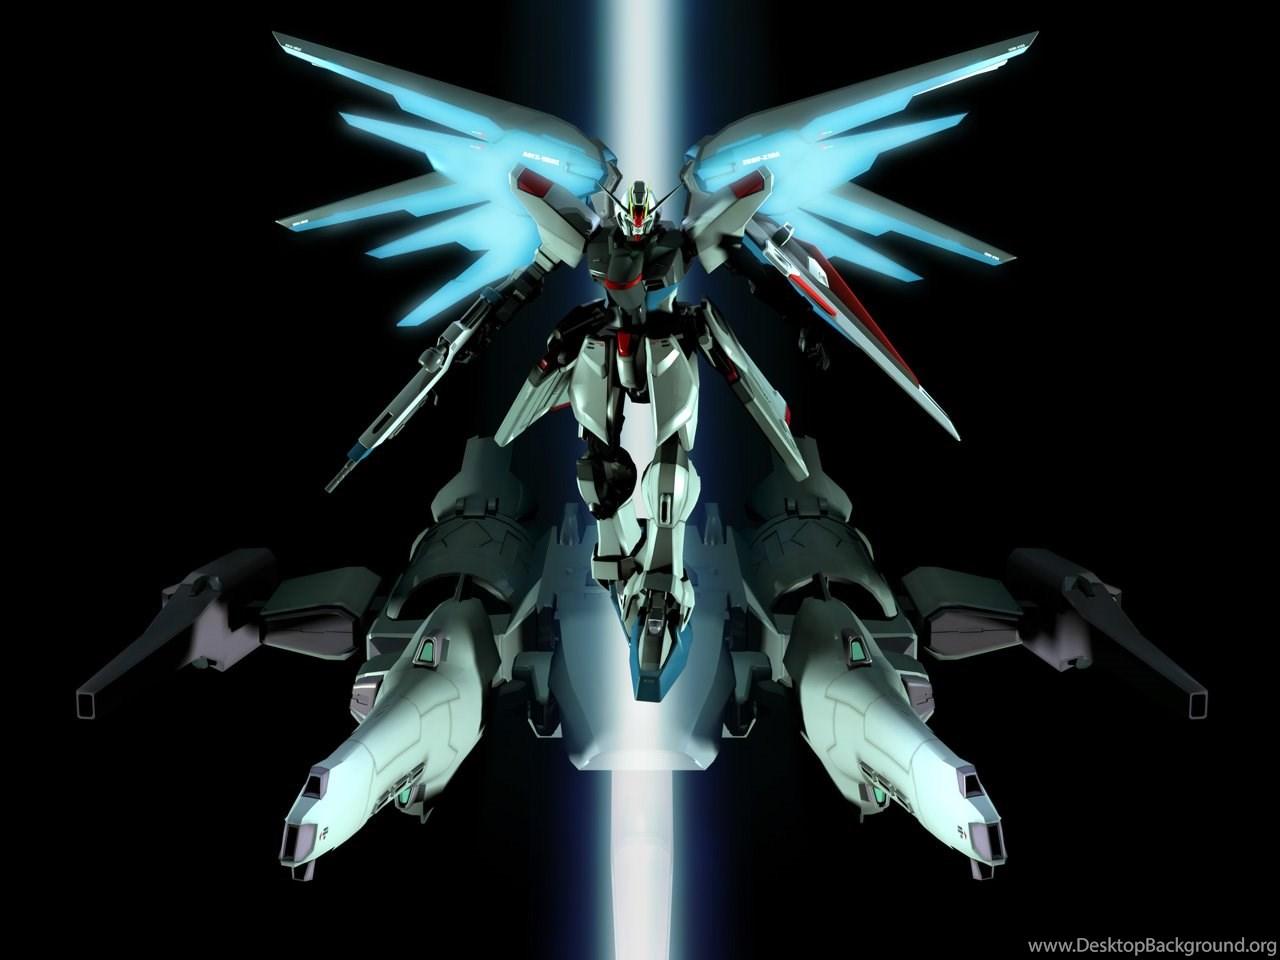 Gundam computer wallpapers desktop backgrounds desktop background fullscreen voltagebd Gallery